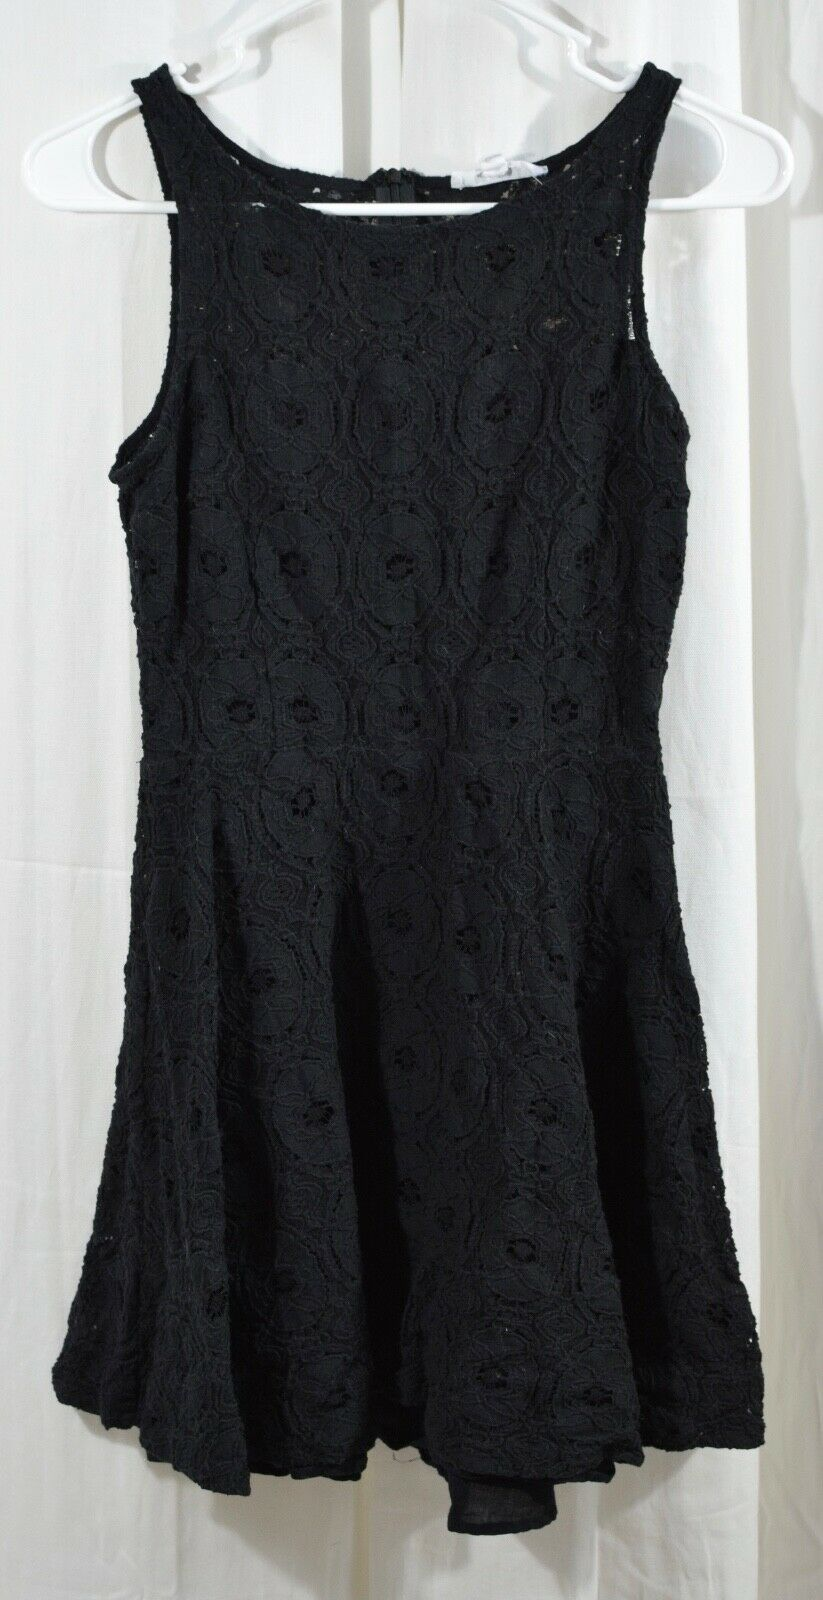 Bb Dakota Woherren Renley Lace Fit & Flare Dress Größe 6